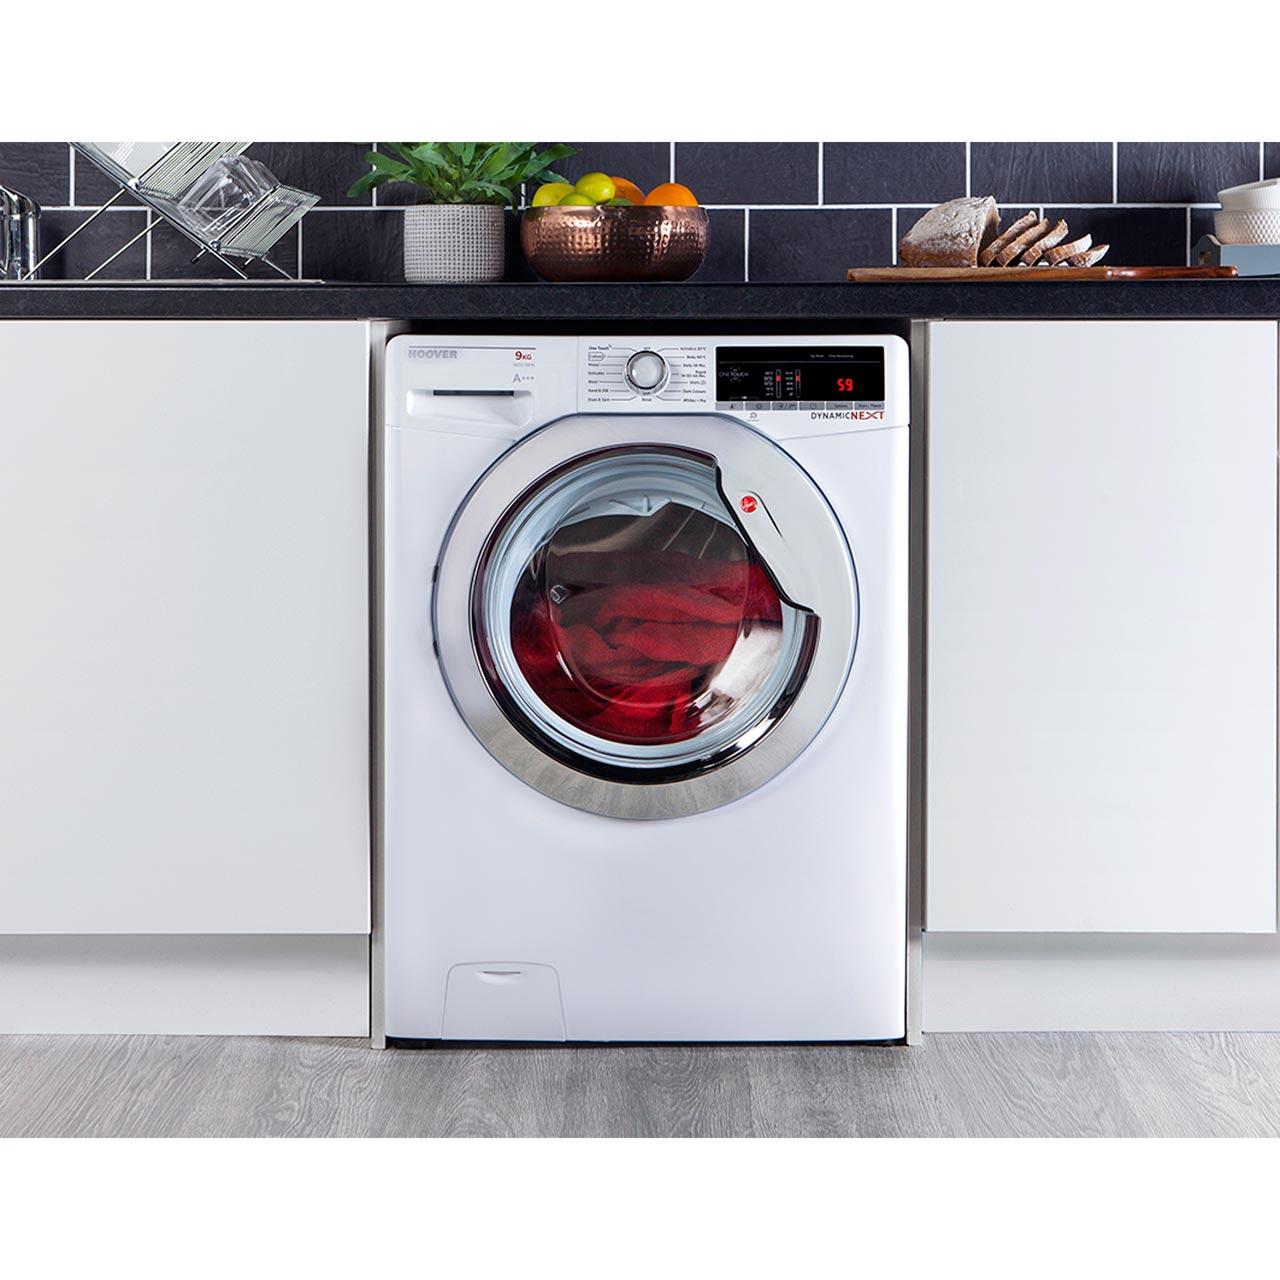 Hoover Dynamic Next Dxoa69c3 9kg Washing Machine With 1600